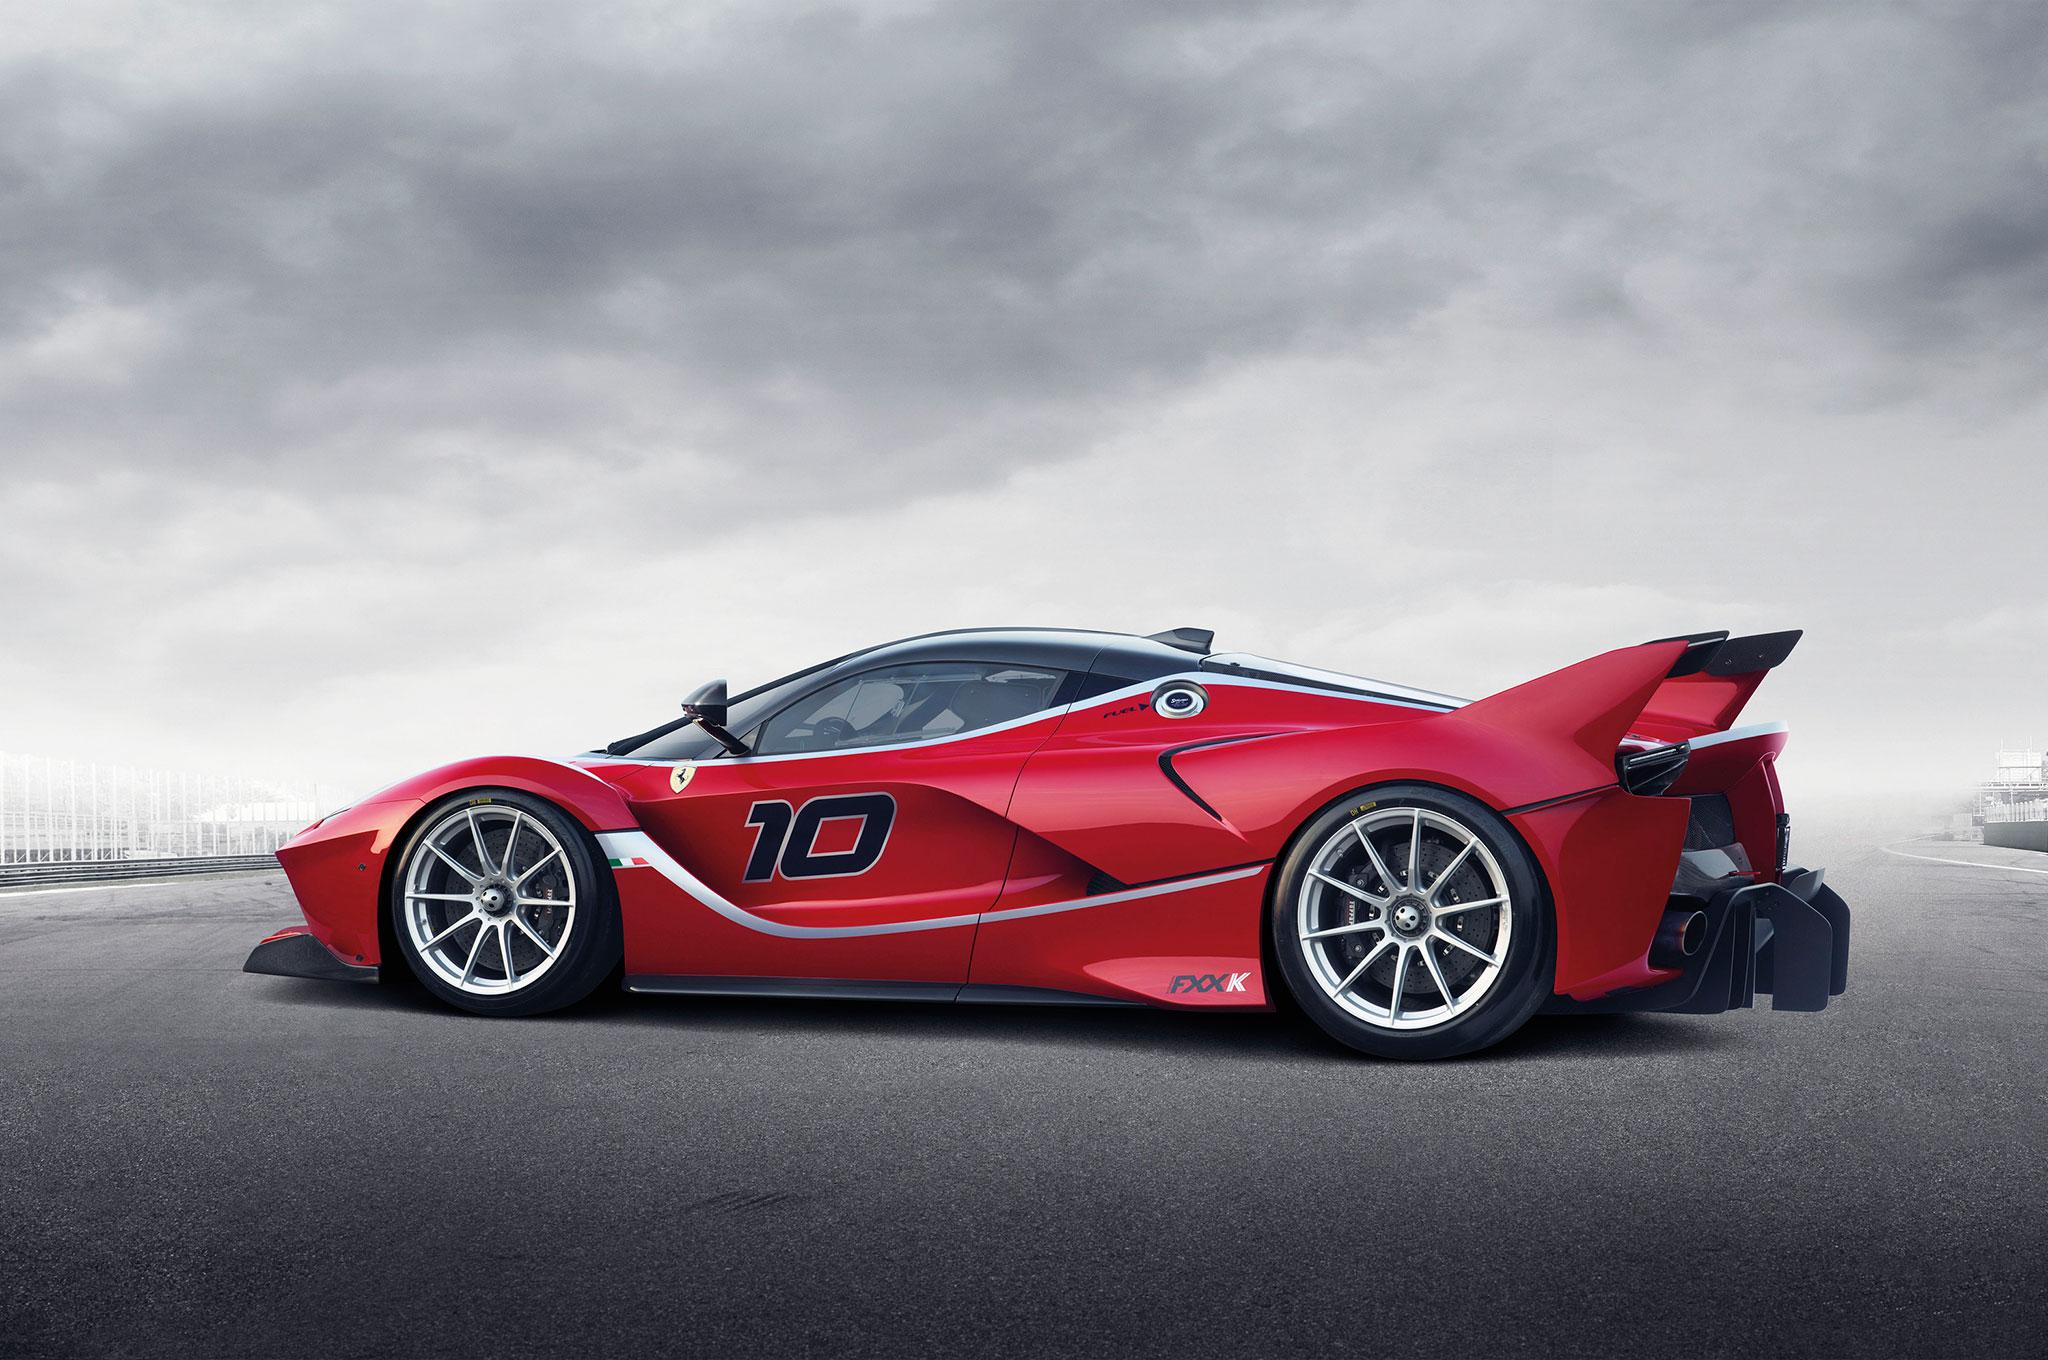 ferrari fxx k debuts in abu dhabi with 1035 hp